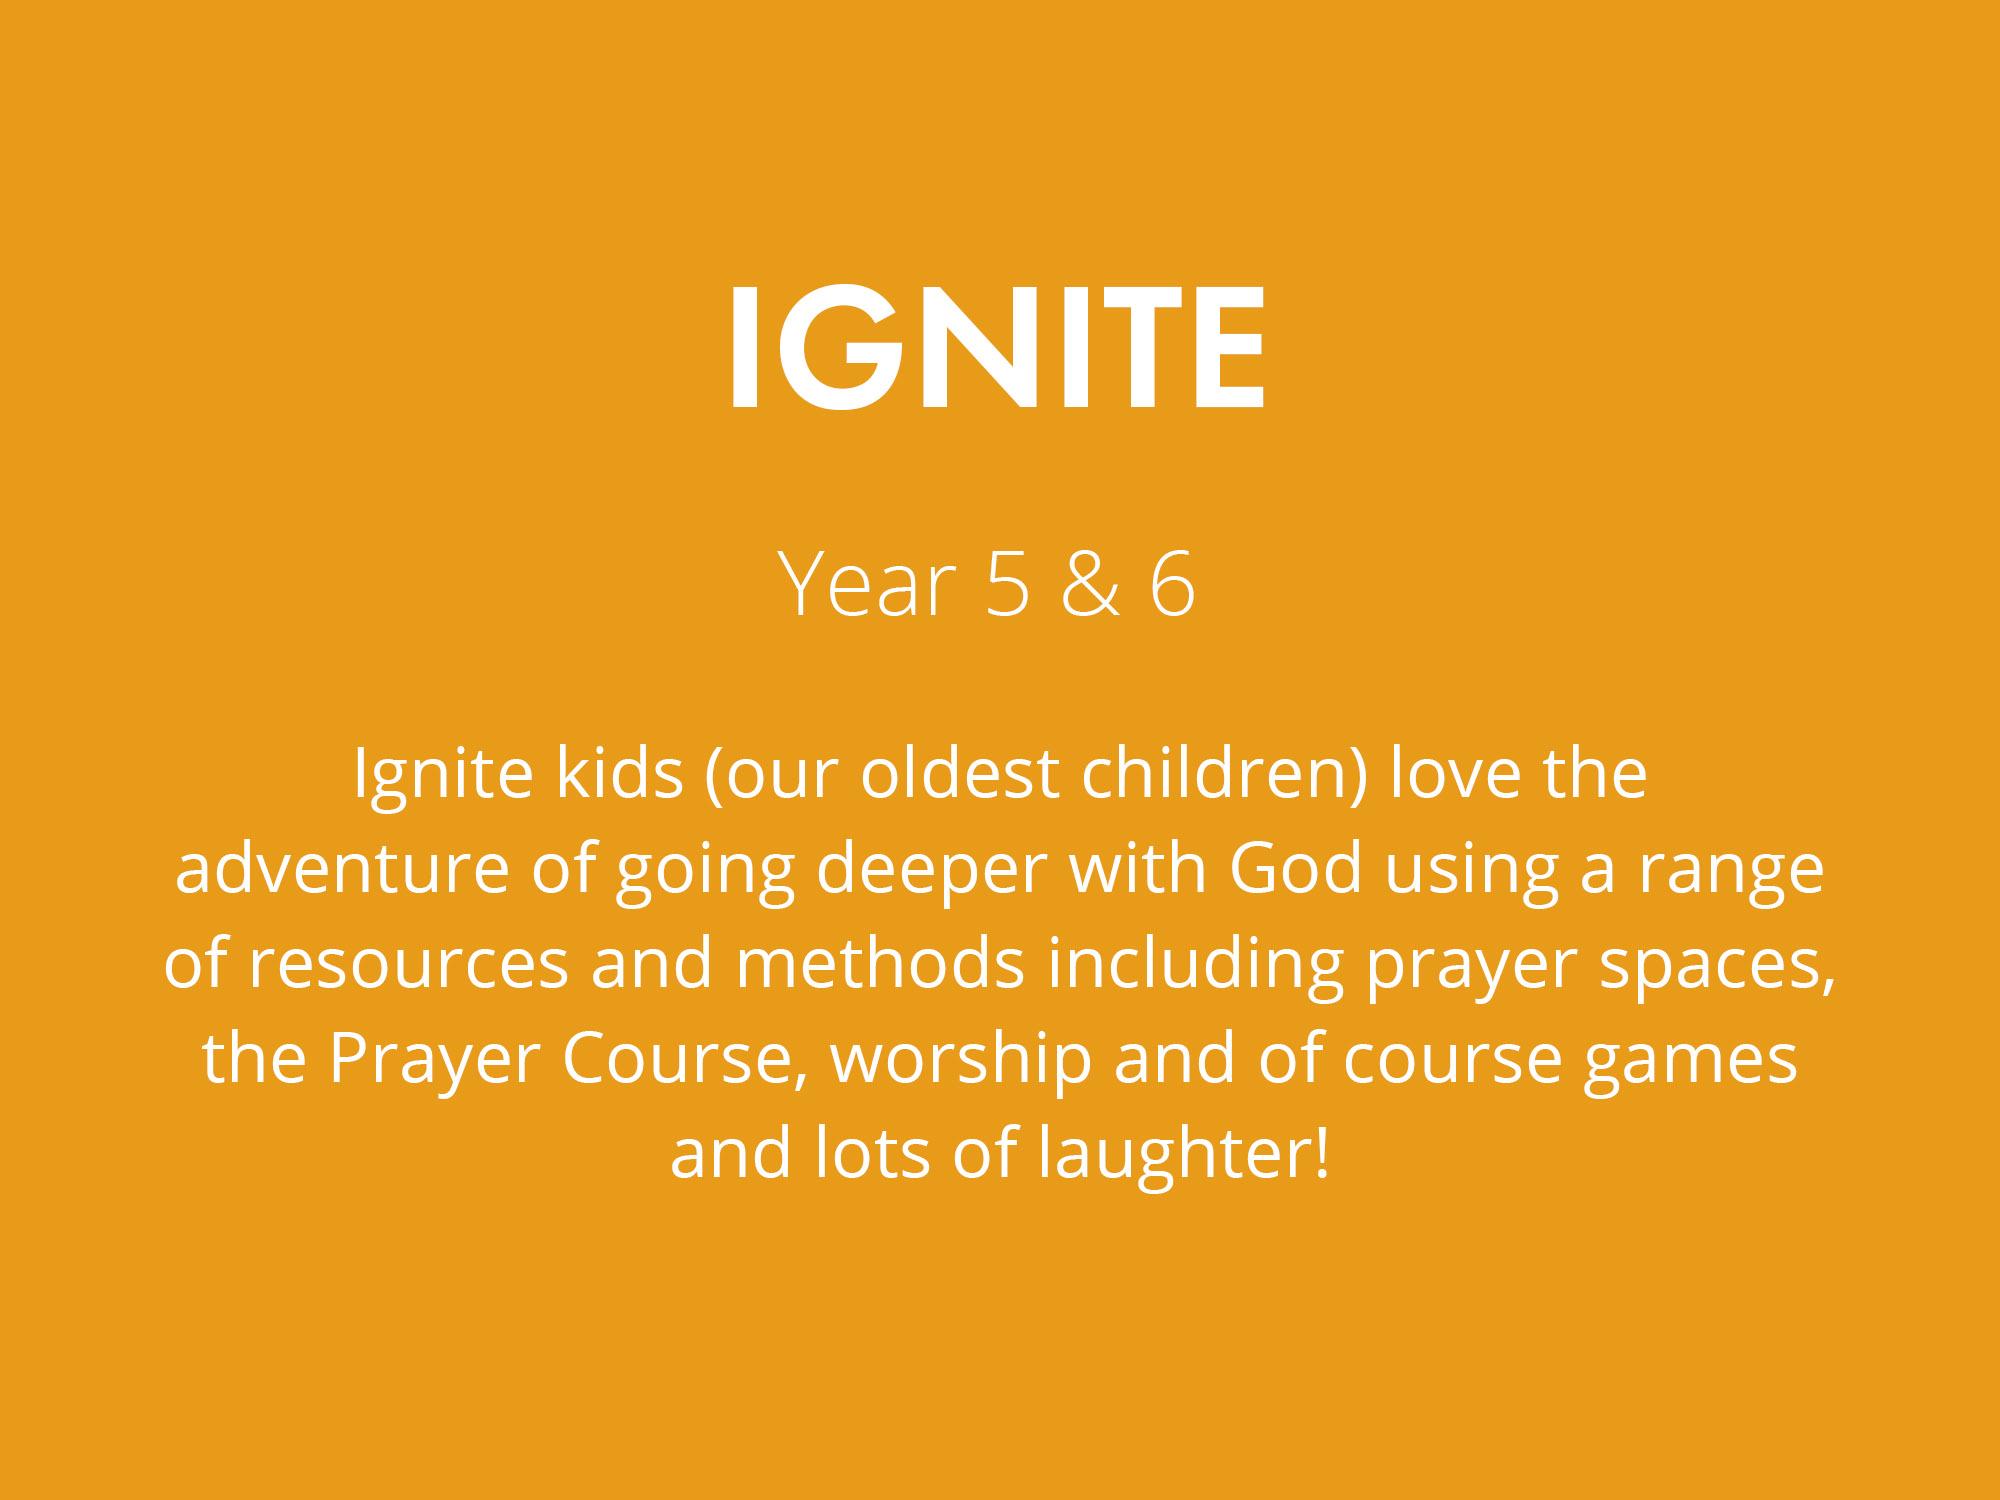 NEW-children-groups-test-ignite.jpg